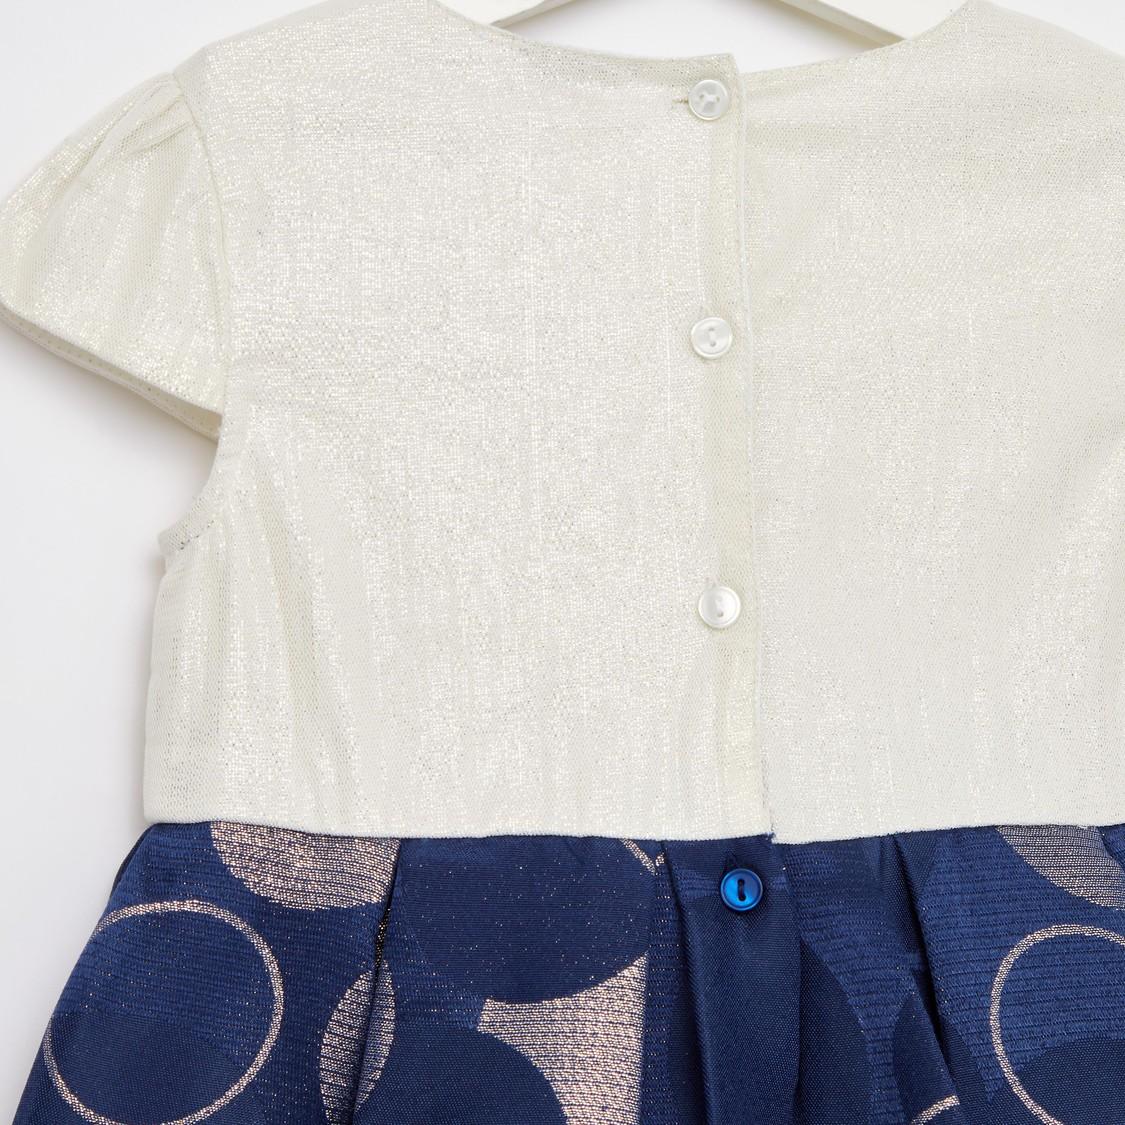 Embellished Jacquard Round Neck Dress with Cap Sleeves